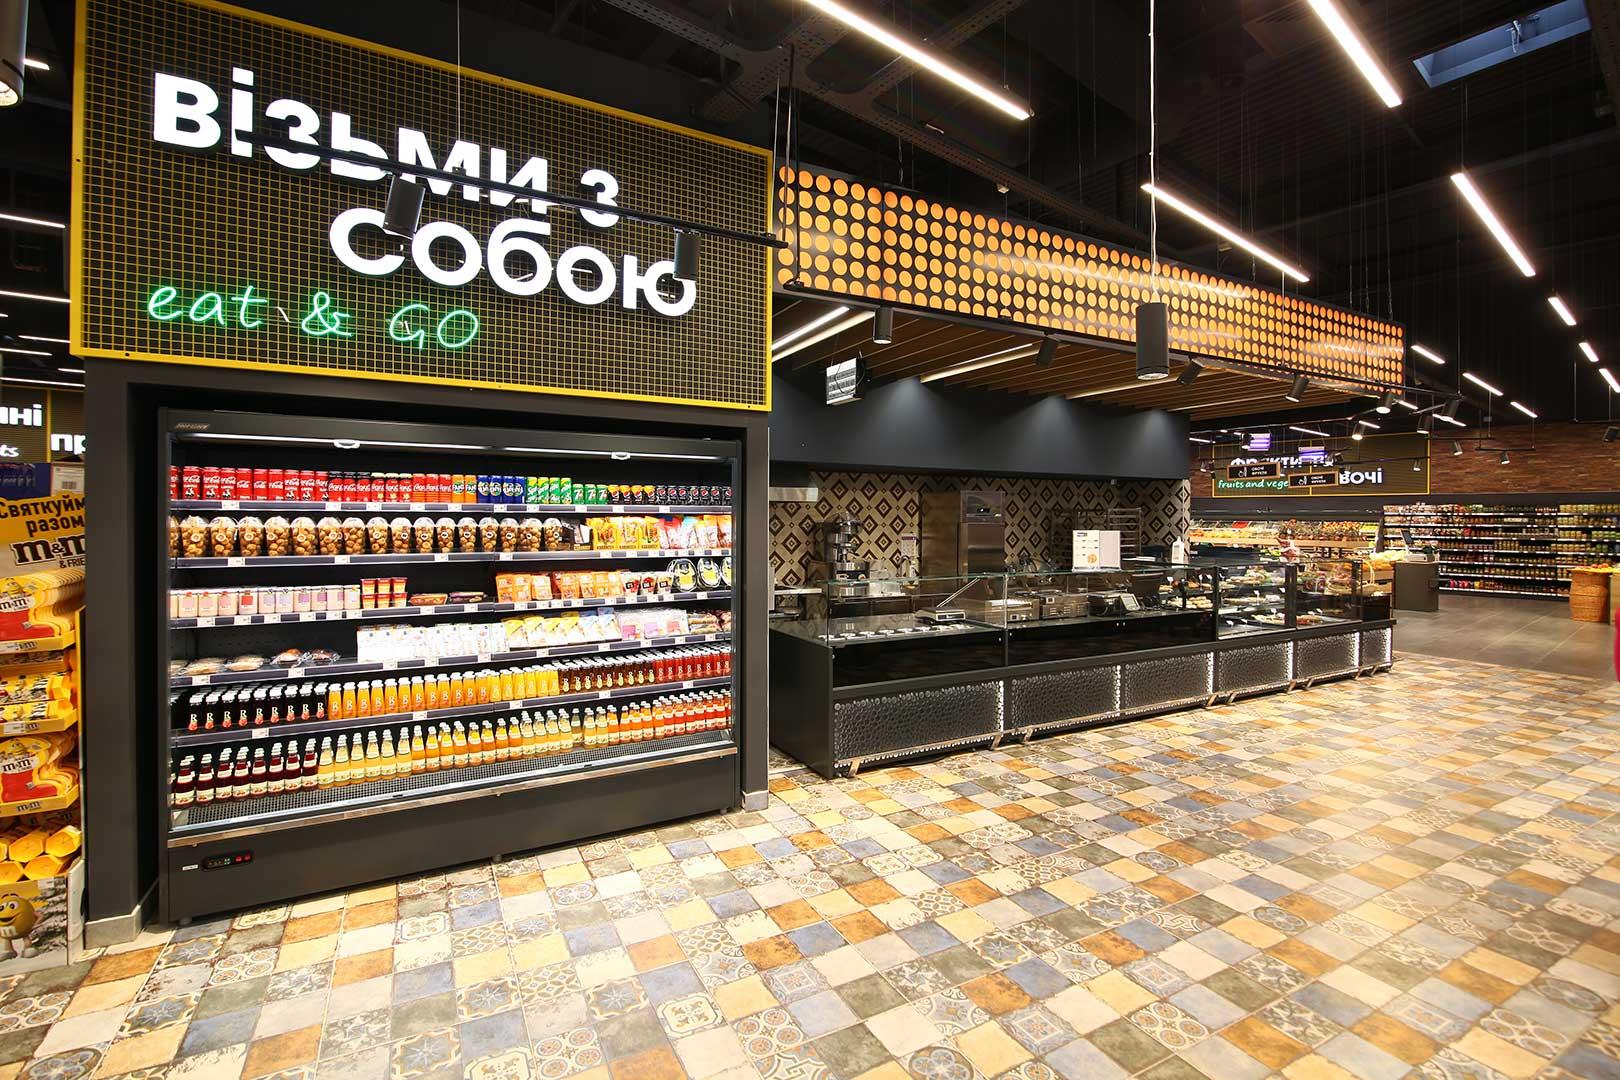 Multideck cabinets Indiana medium AV 066 MT O 210-DLA, counters Missouri MC 120 sushi/pizza L 130-DBM, Missouri NC 120 L 130